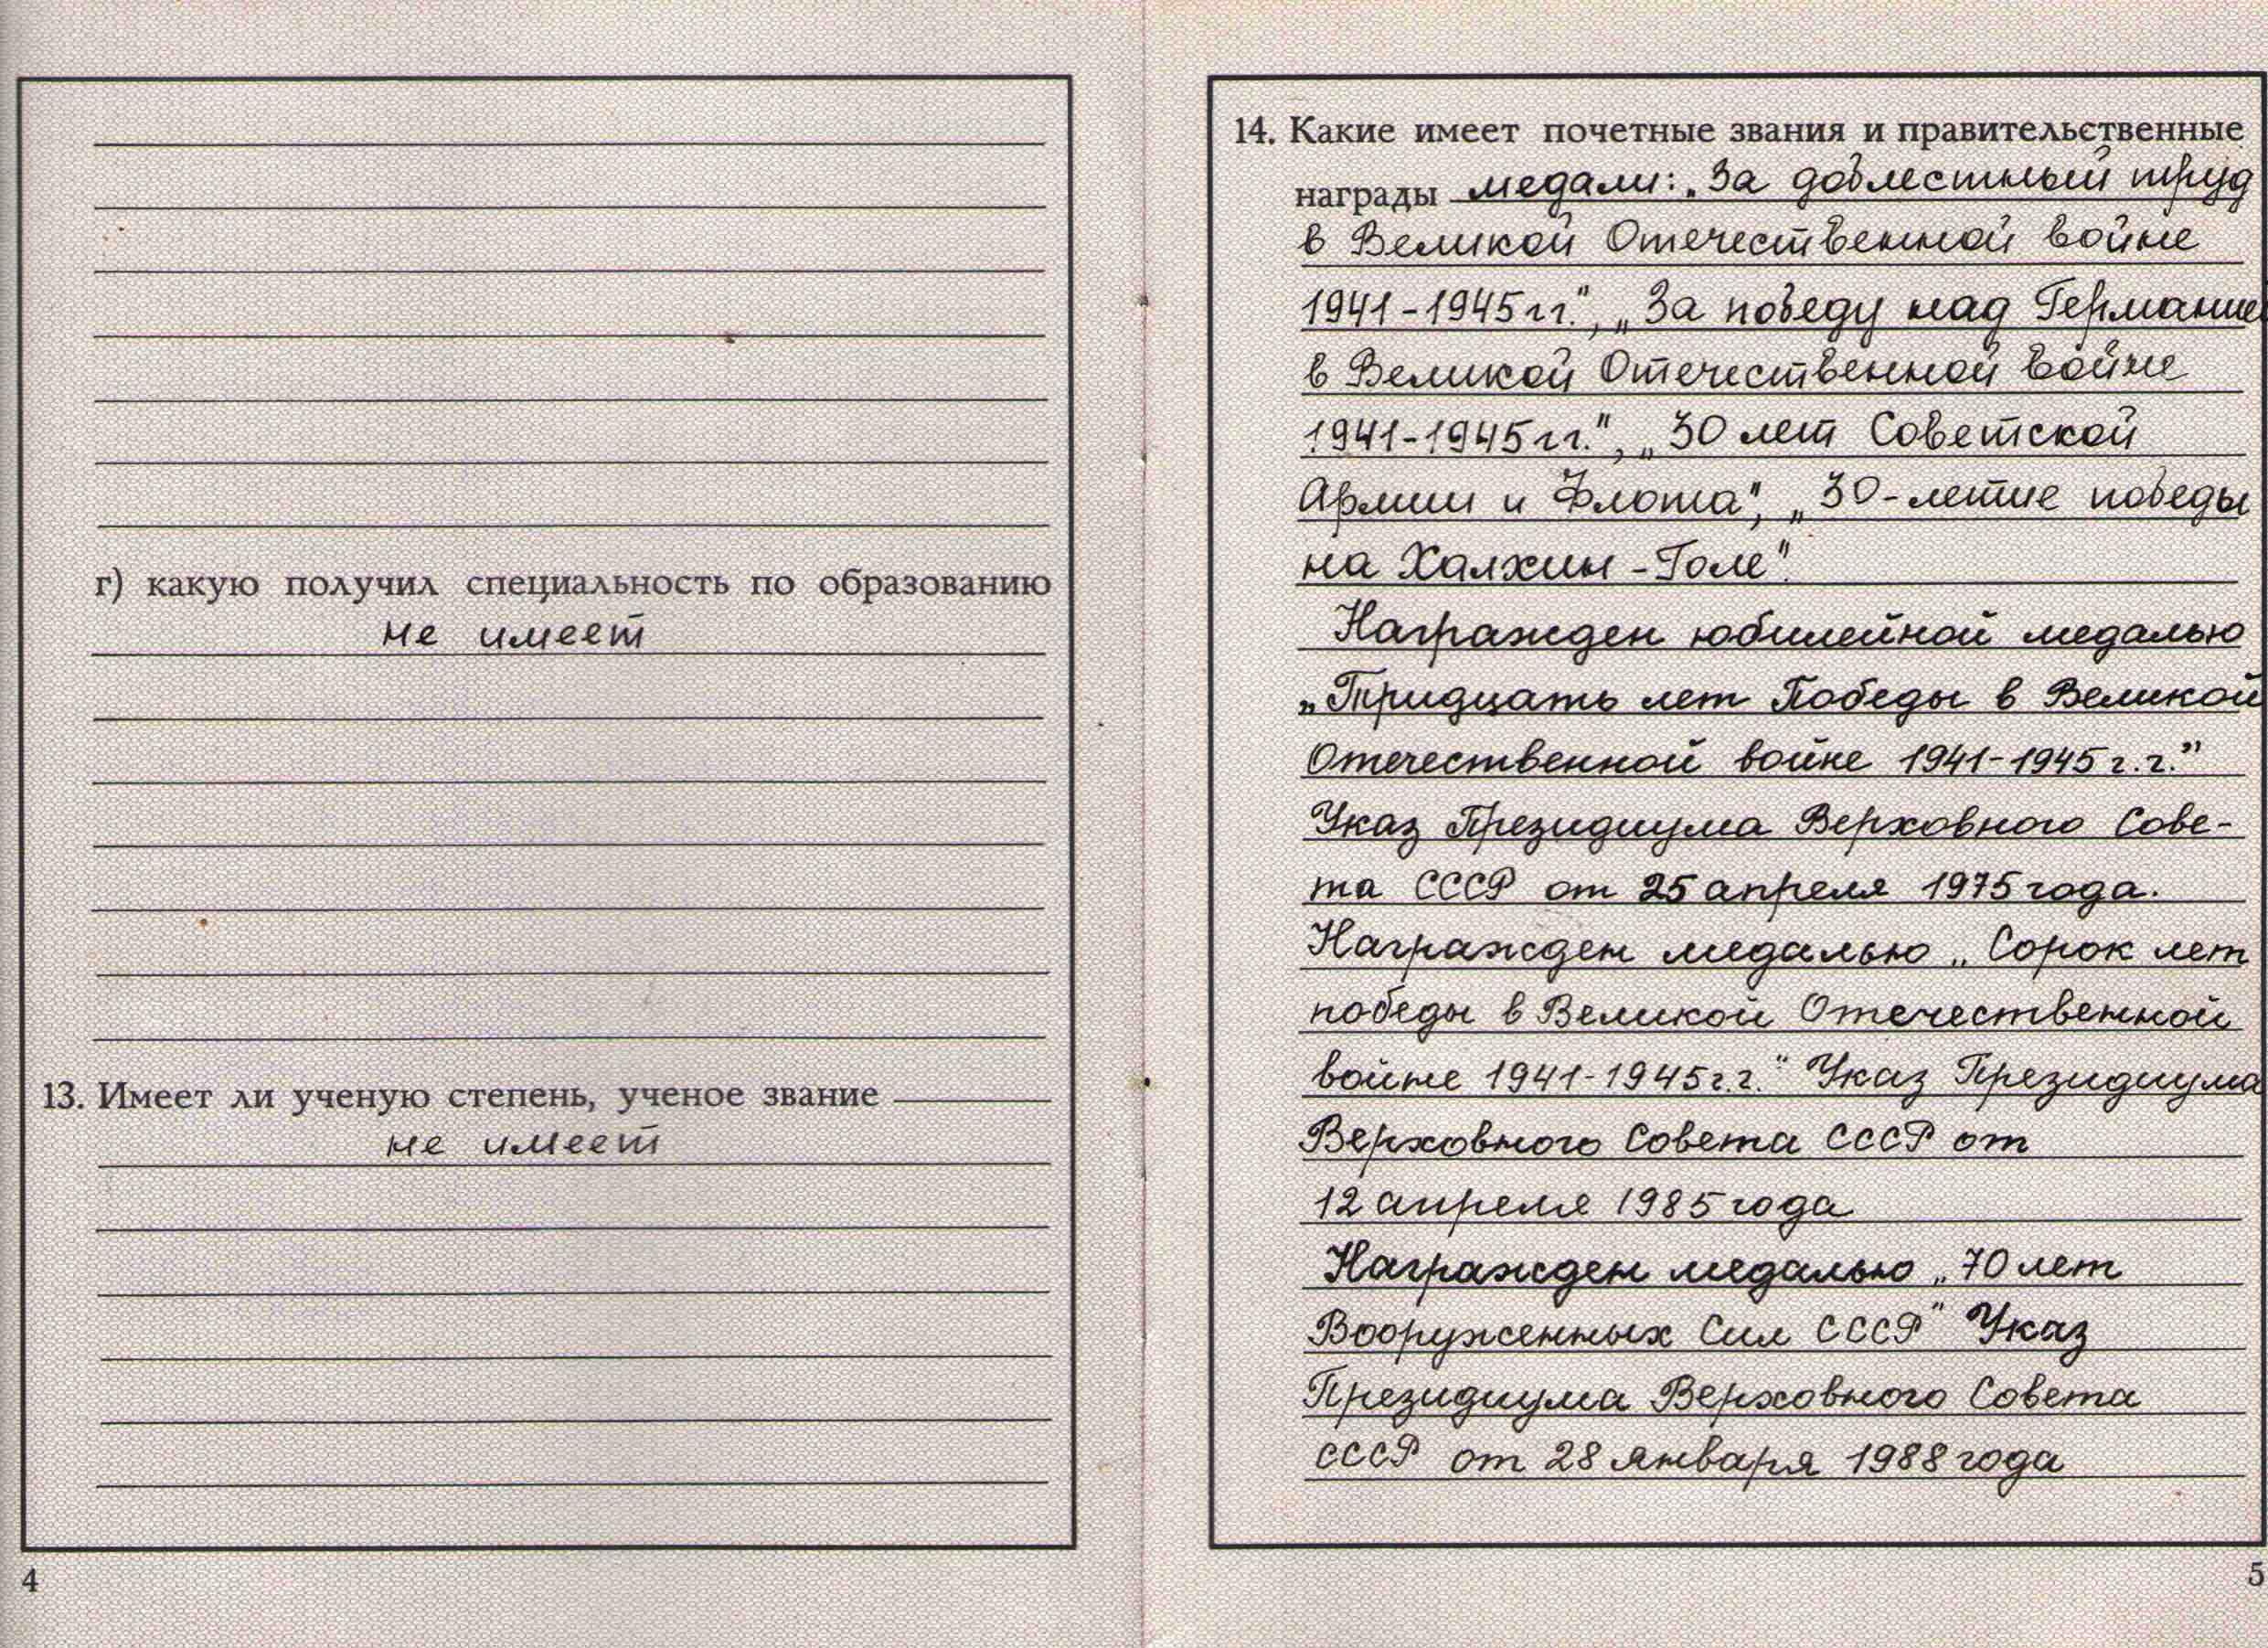 81. Учетная карточка члена партии Барыкина ПП, 1974.